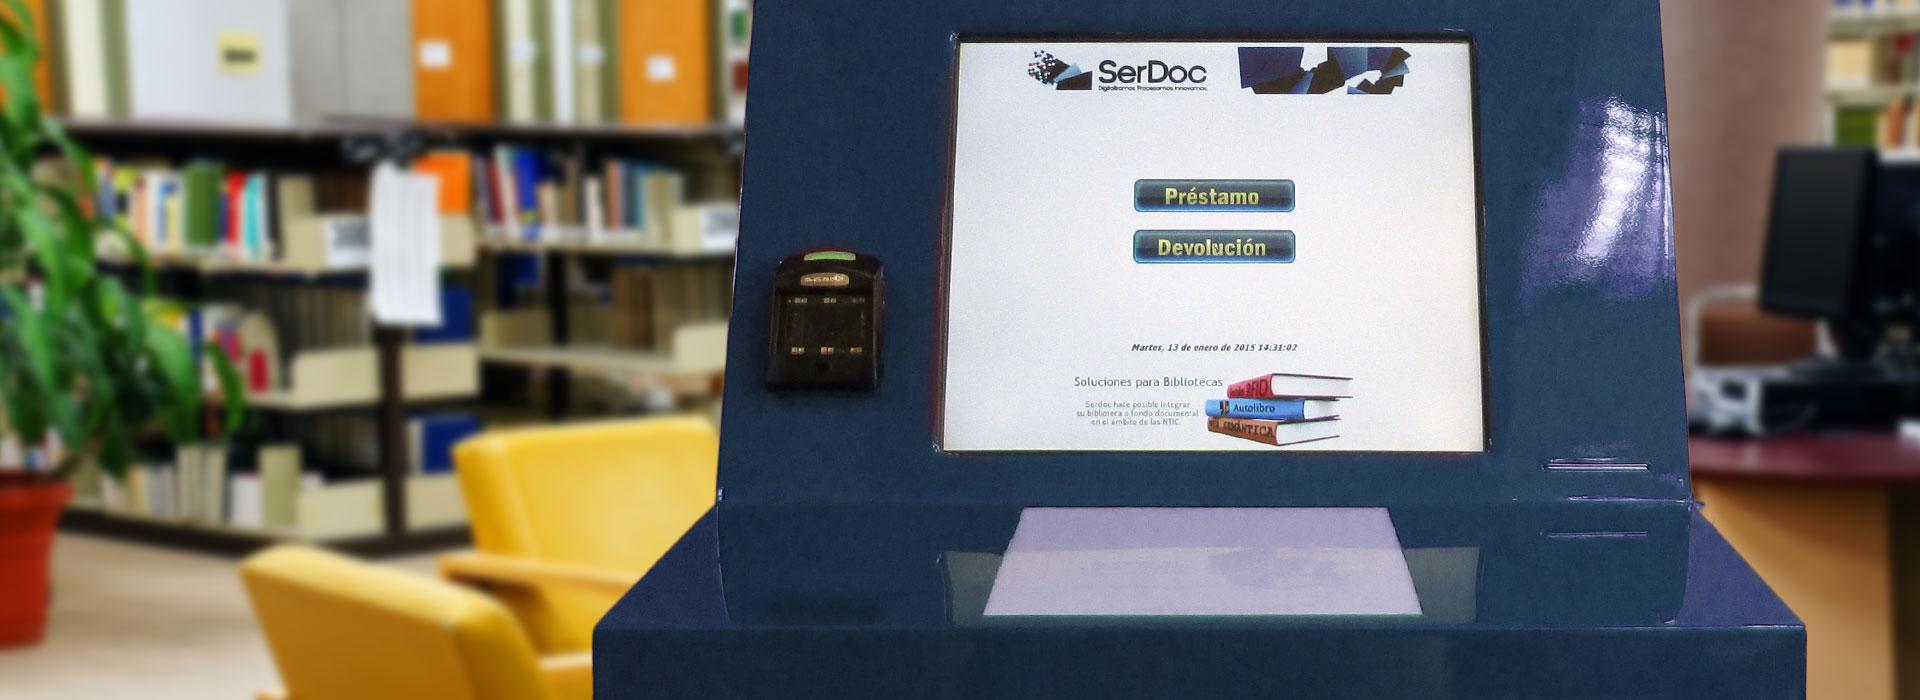 Autopréstamo sin RFID por SerDoc